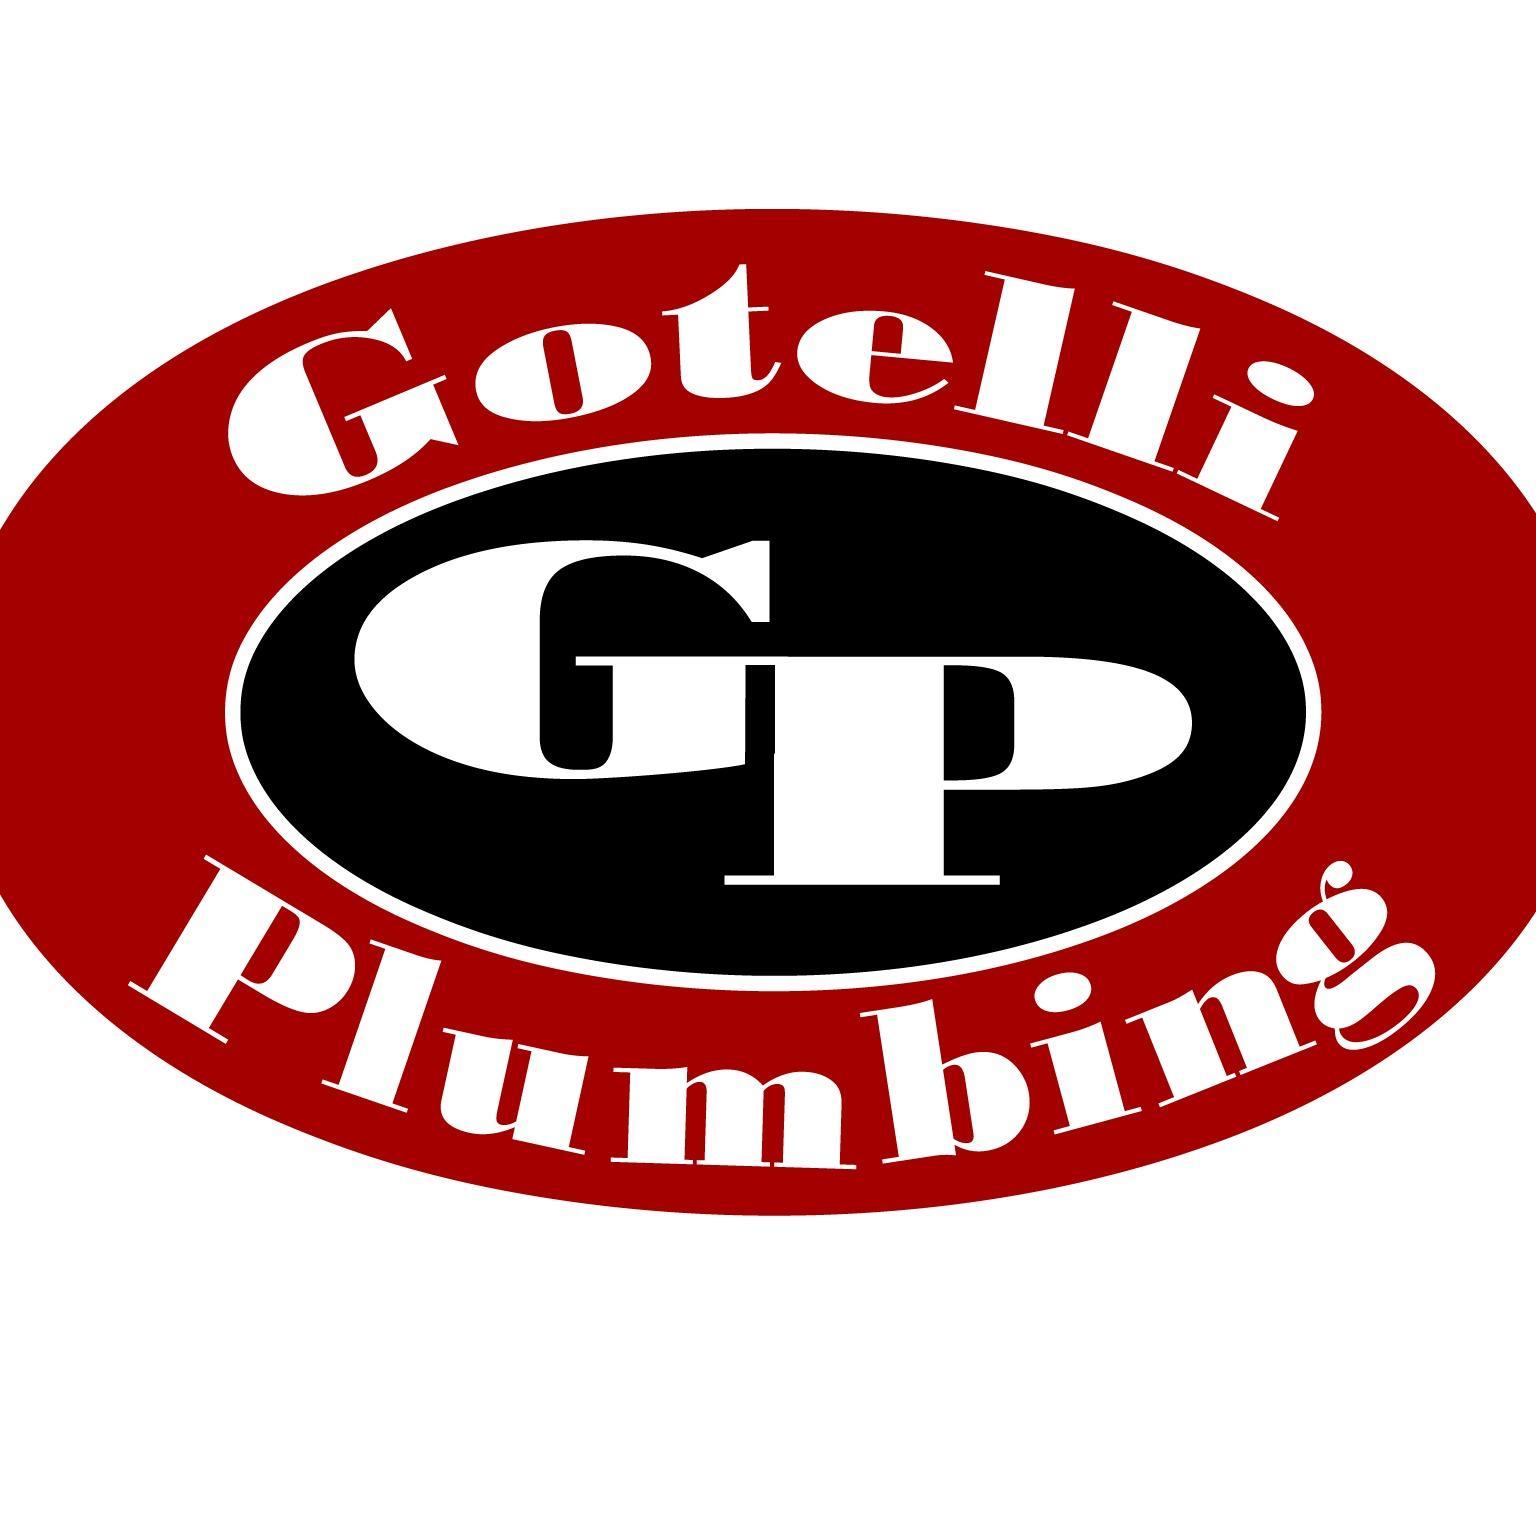 Gotelli Plumbing Co.